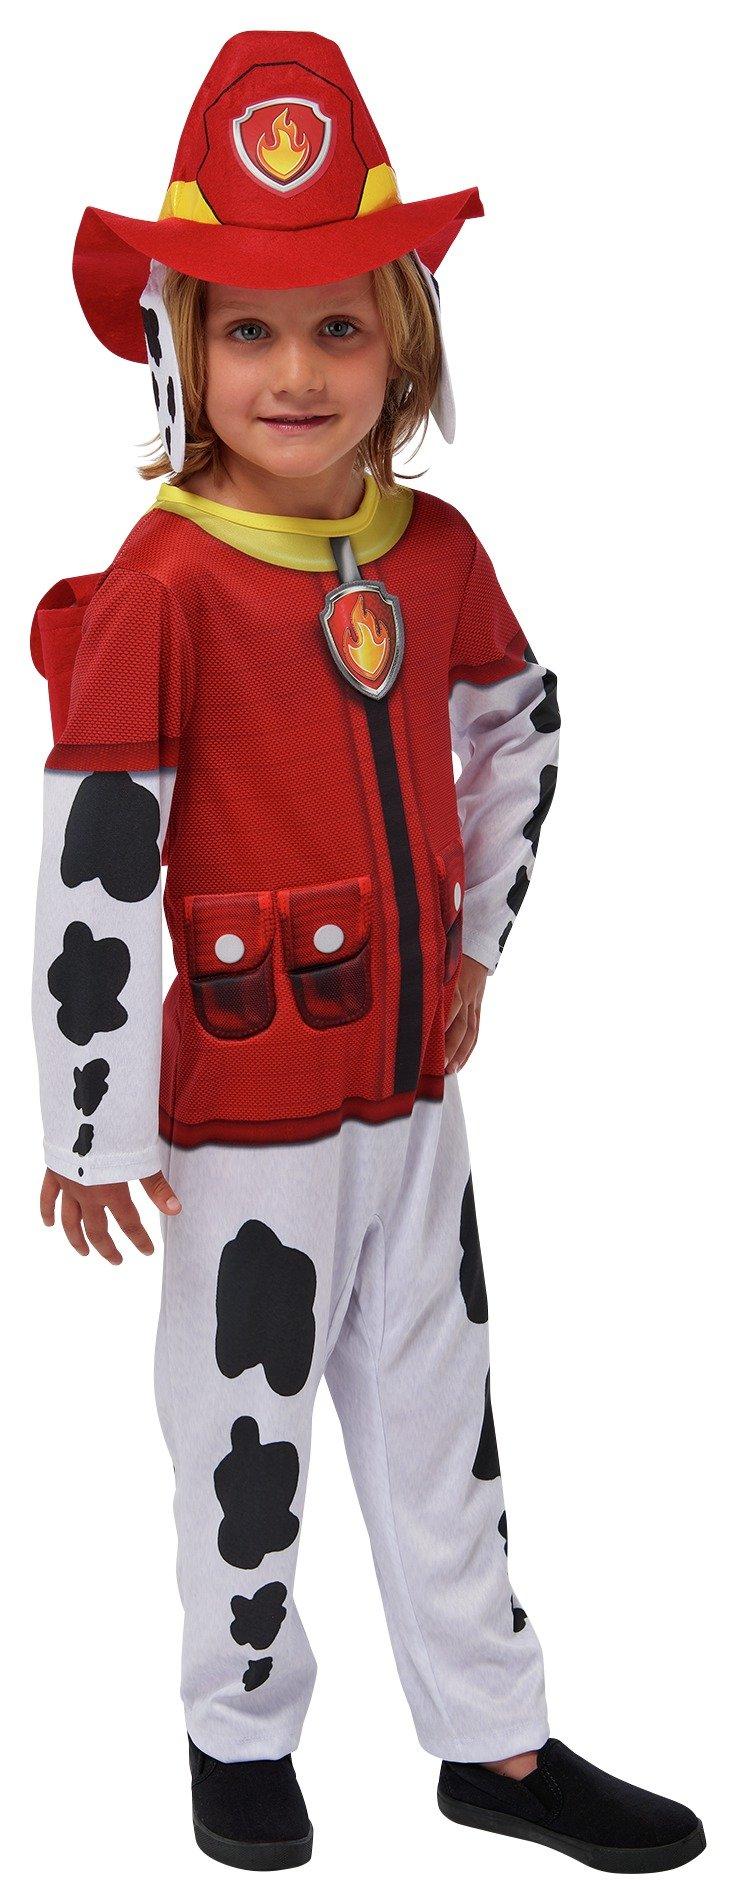 PAW Patrol Marshall Fancy Dress Costume - 3-4 Years